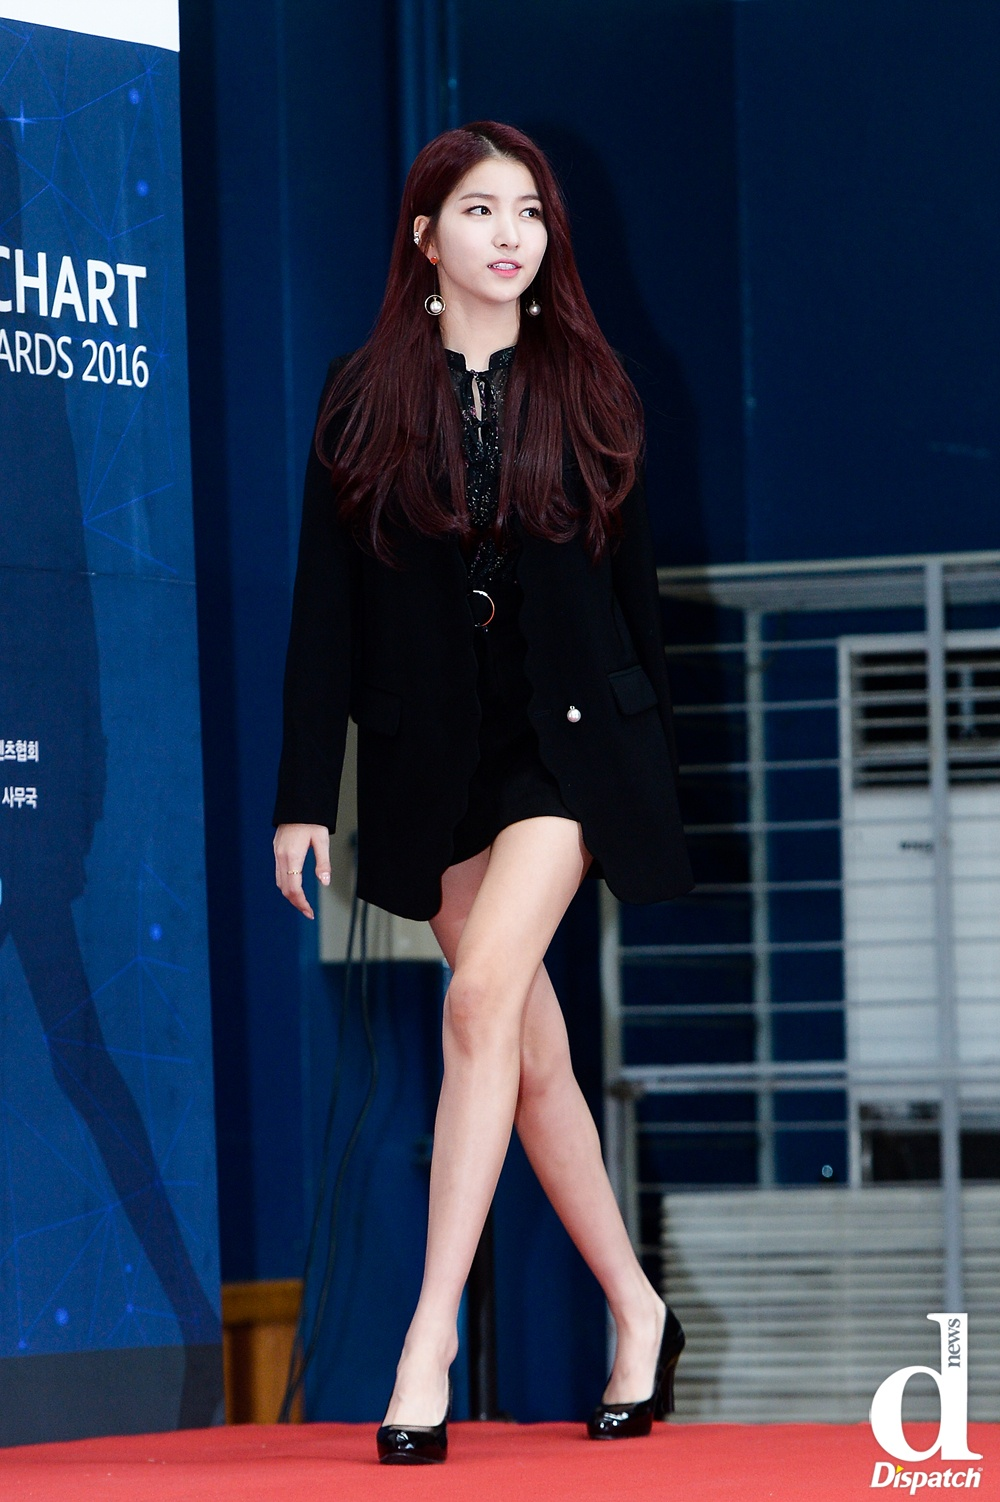 G Friend S Sowon Might Have The Longest Legs In K Pop